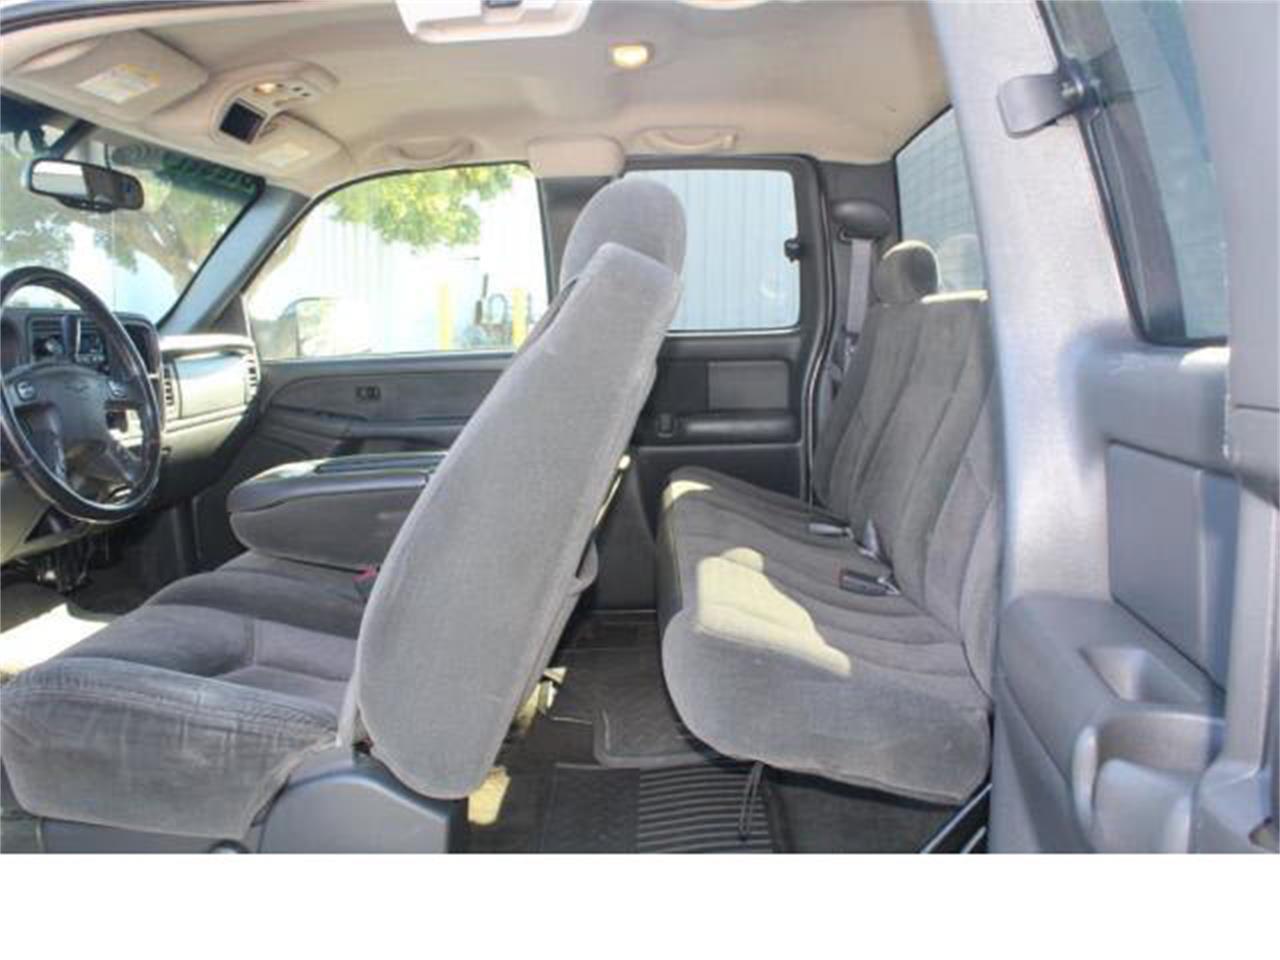 Large Picture of '03 Chevrolet Silverado located in Washington - $11,990.00 - M5R3